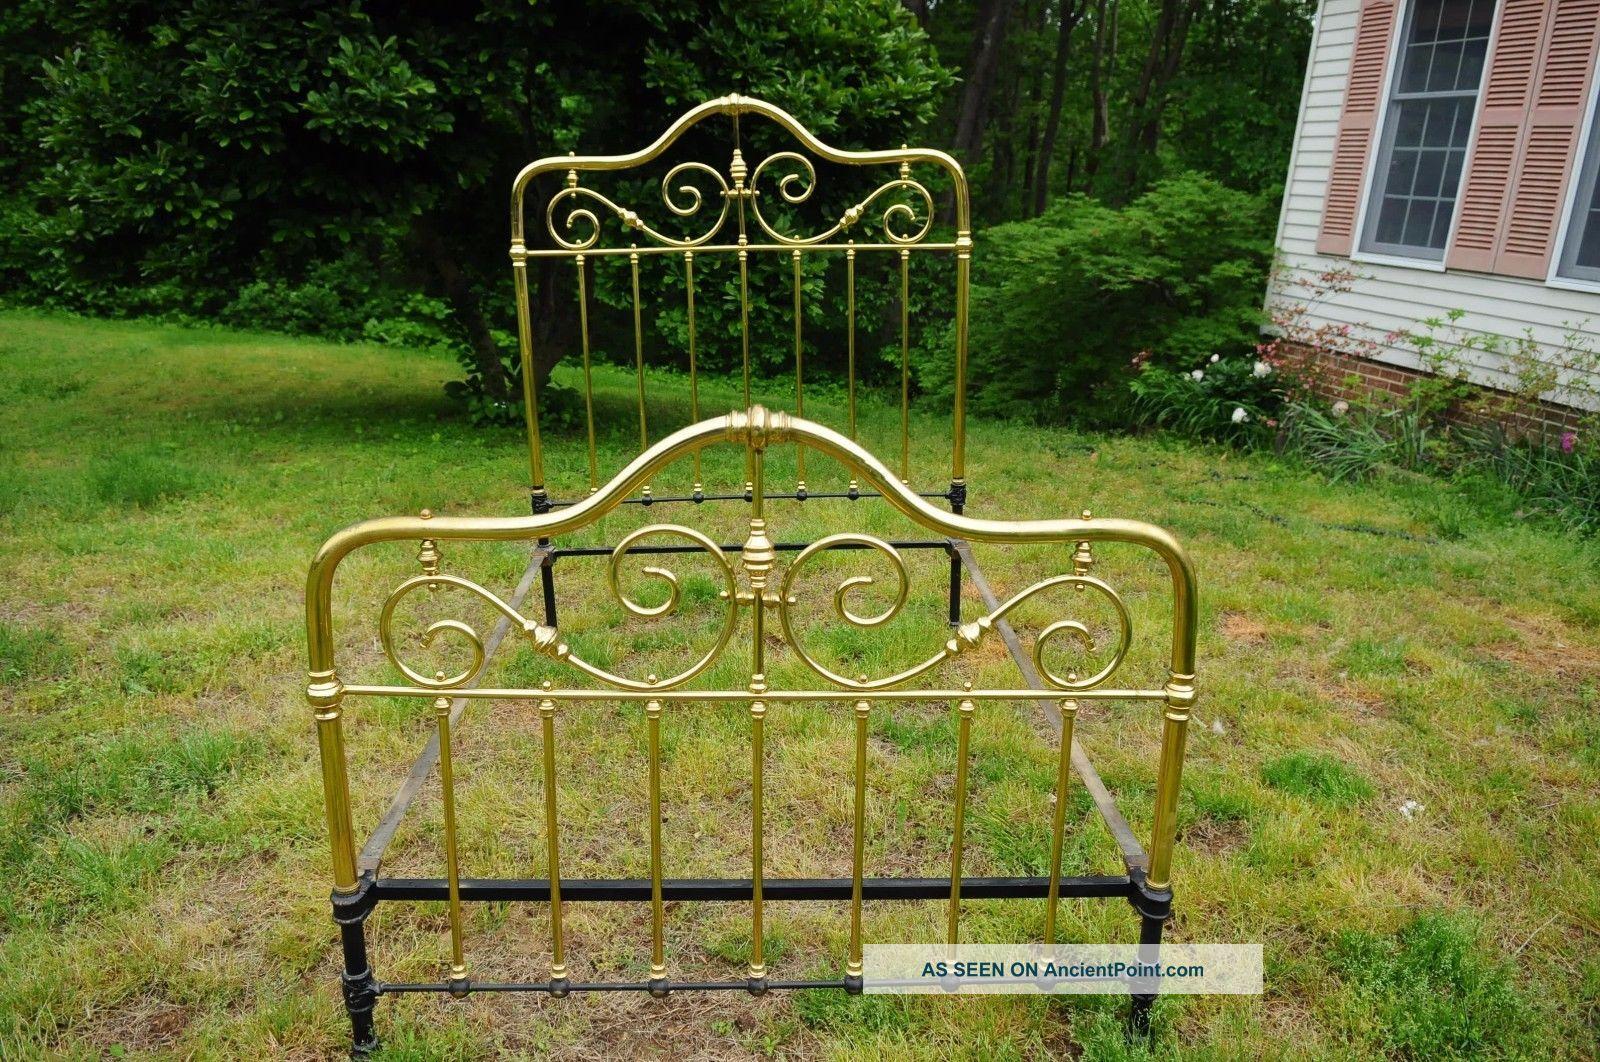 Vintage Brass Bed Frame Full Size Includes Side Rails 1900-1950 photo